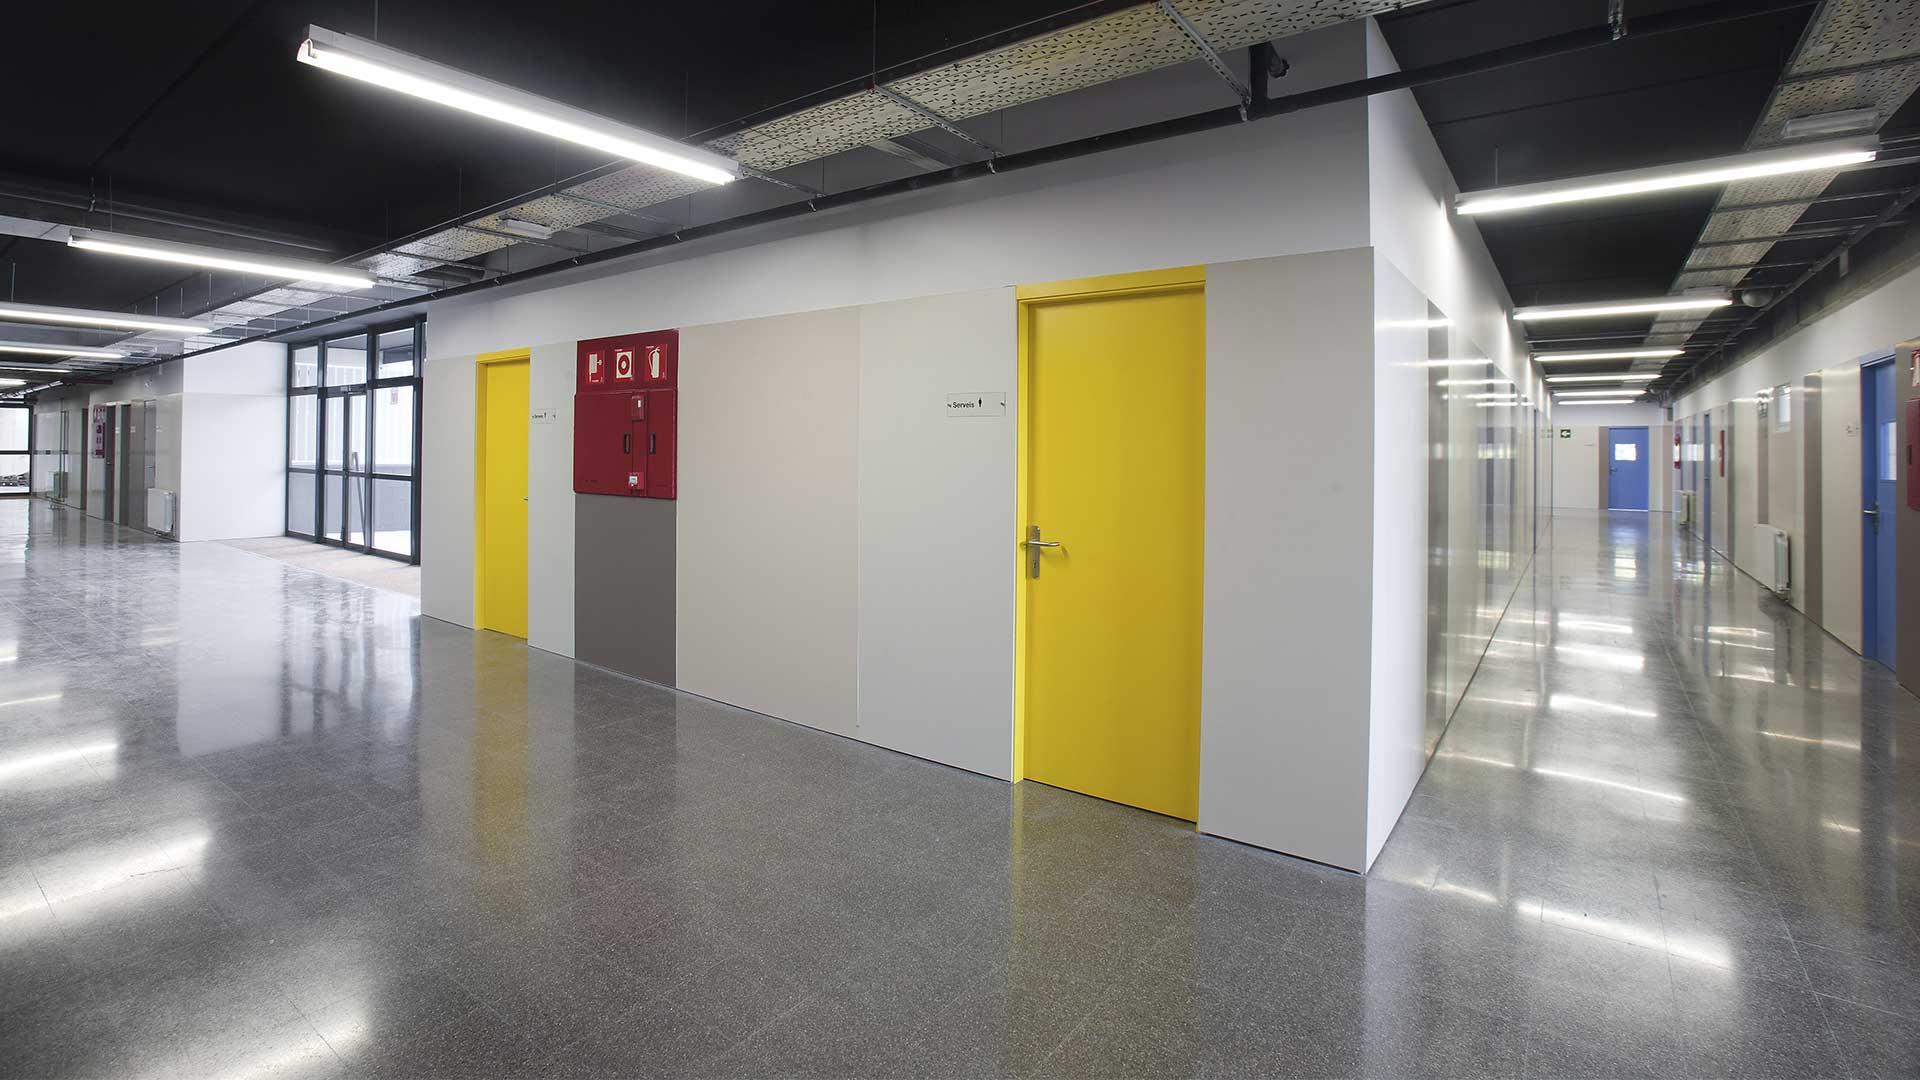 prefabricats-pujol-terratzo-paviment-escoles-montornes-3